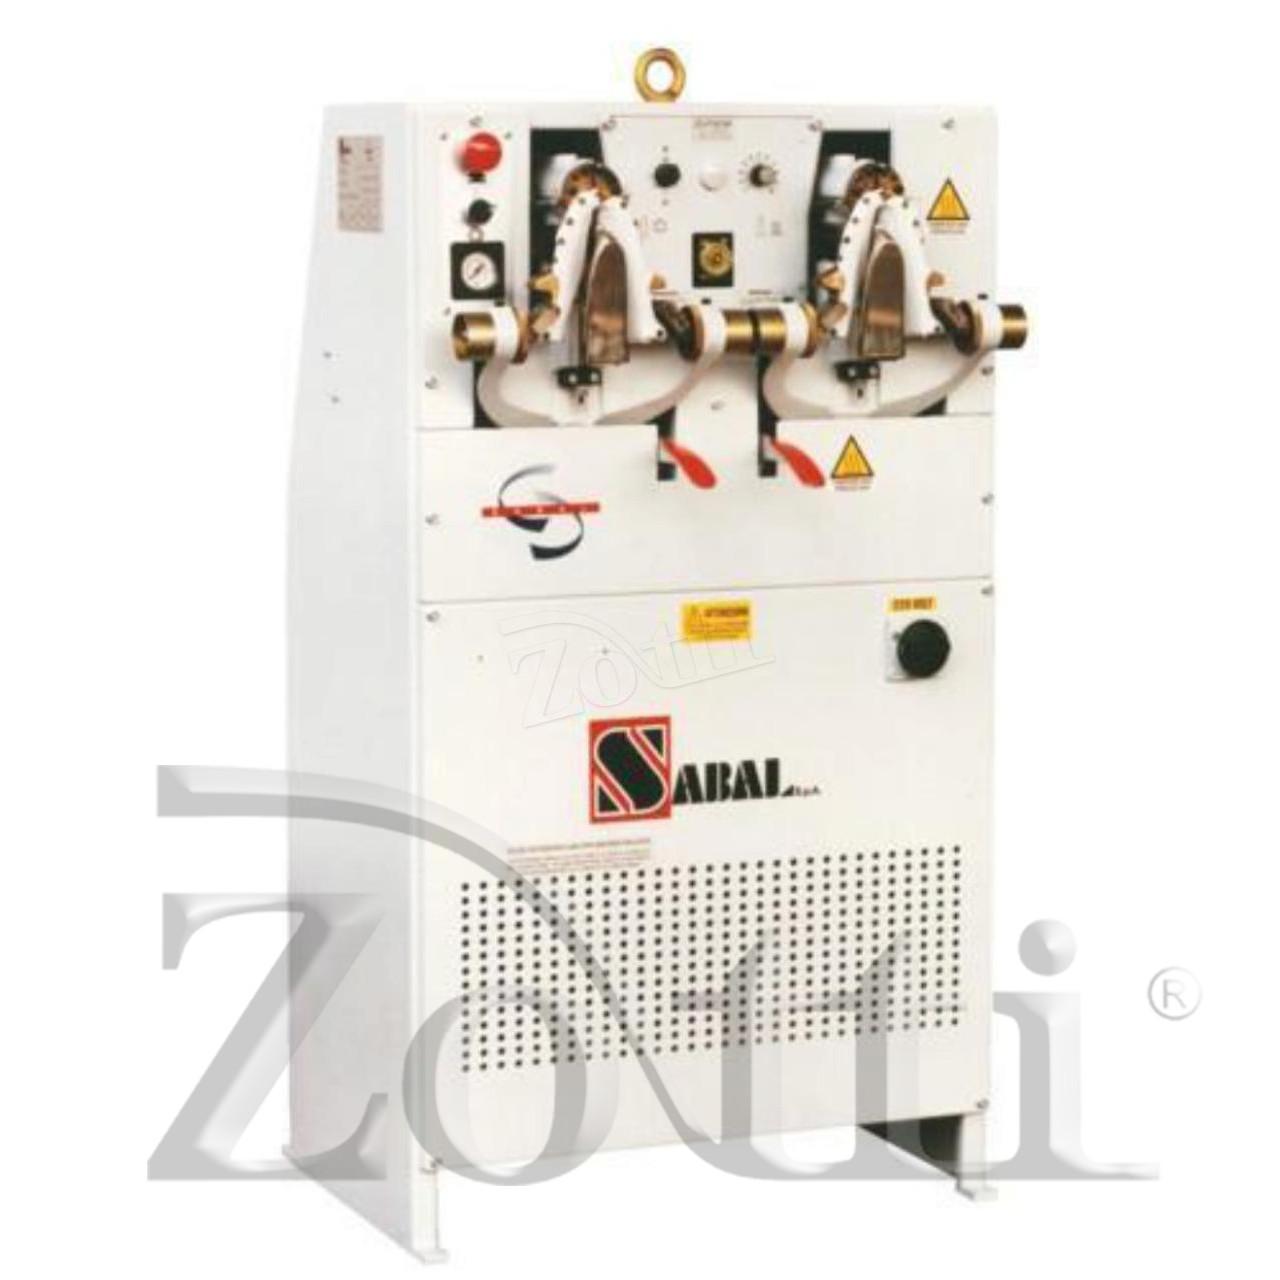 Машина для поформовки пятки и канта обуви SABAL мод. 852/U/D - 854/U/D